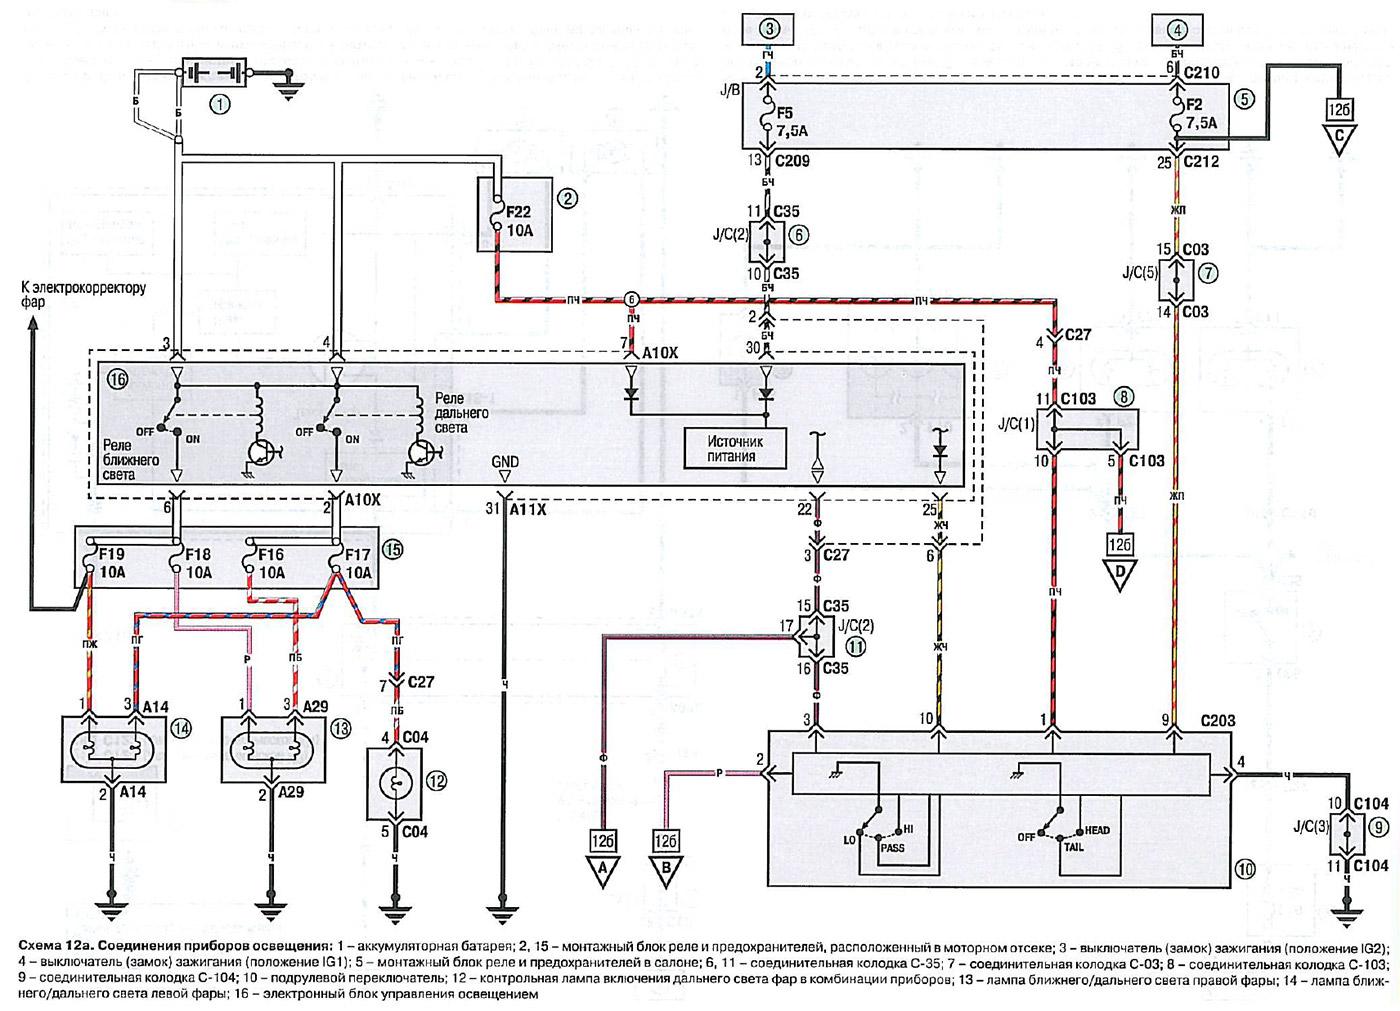 Схема электрооборудования мицубиси лансер фото 564